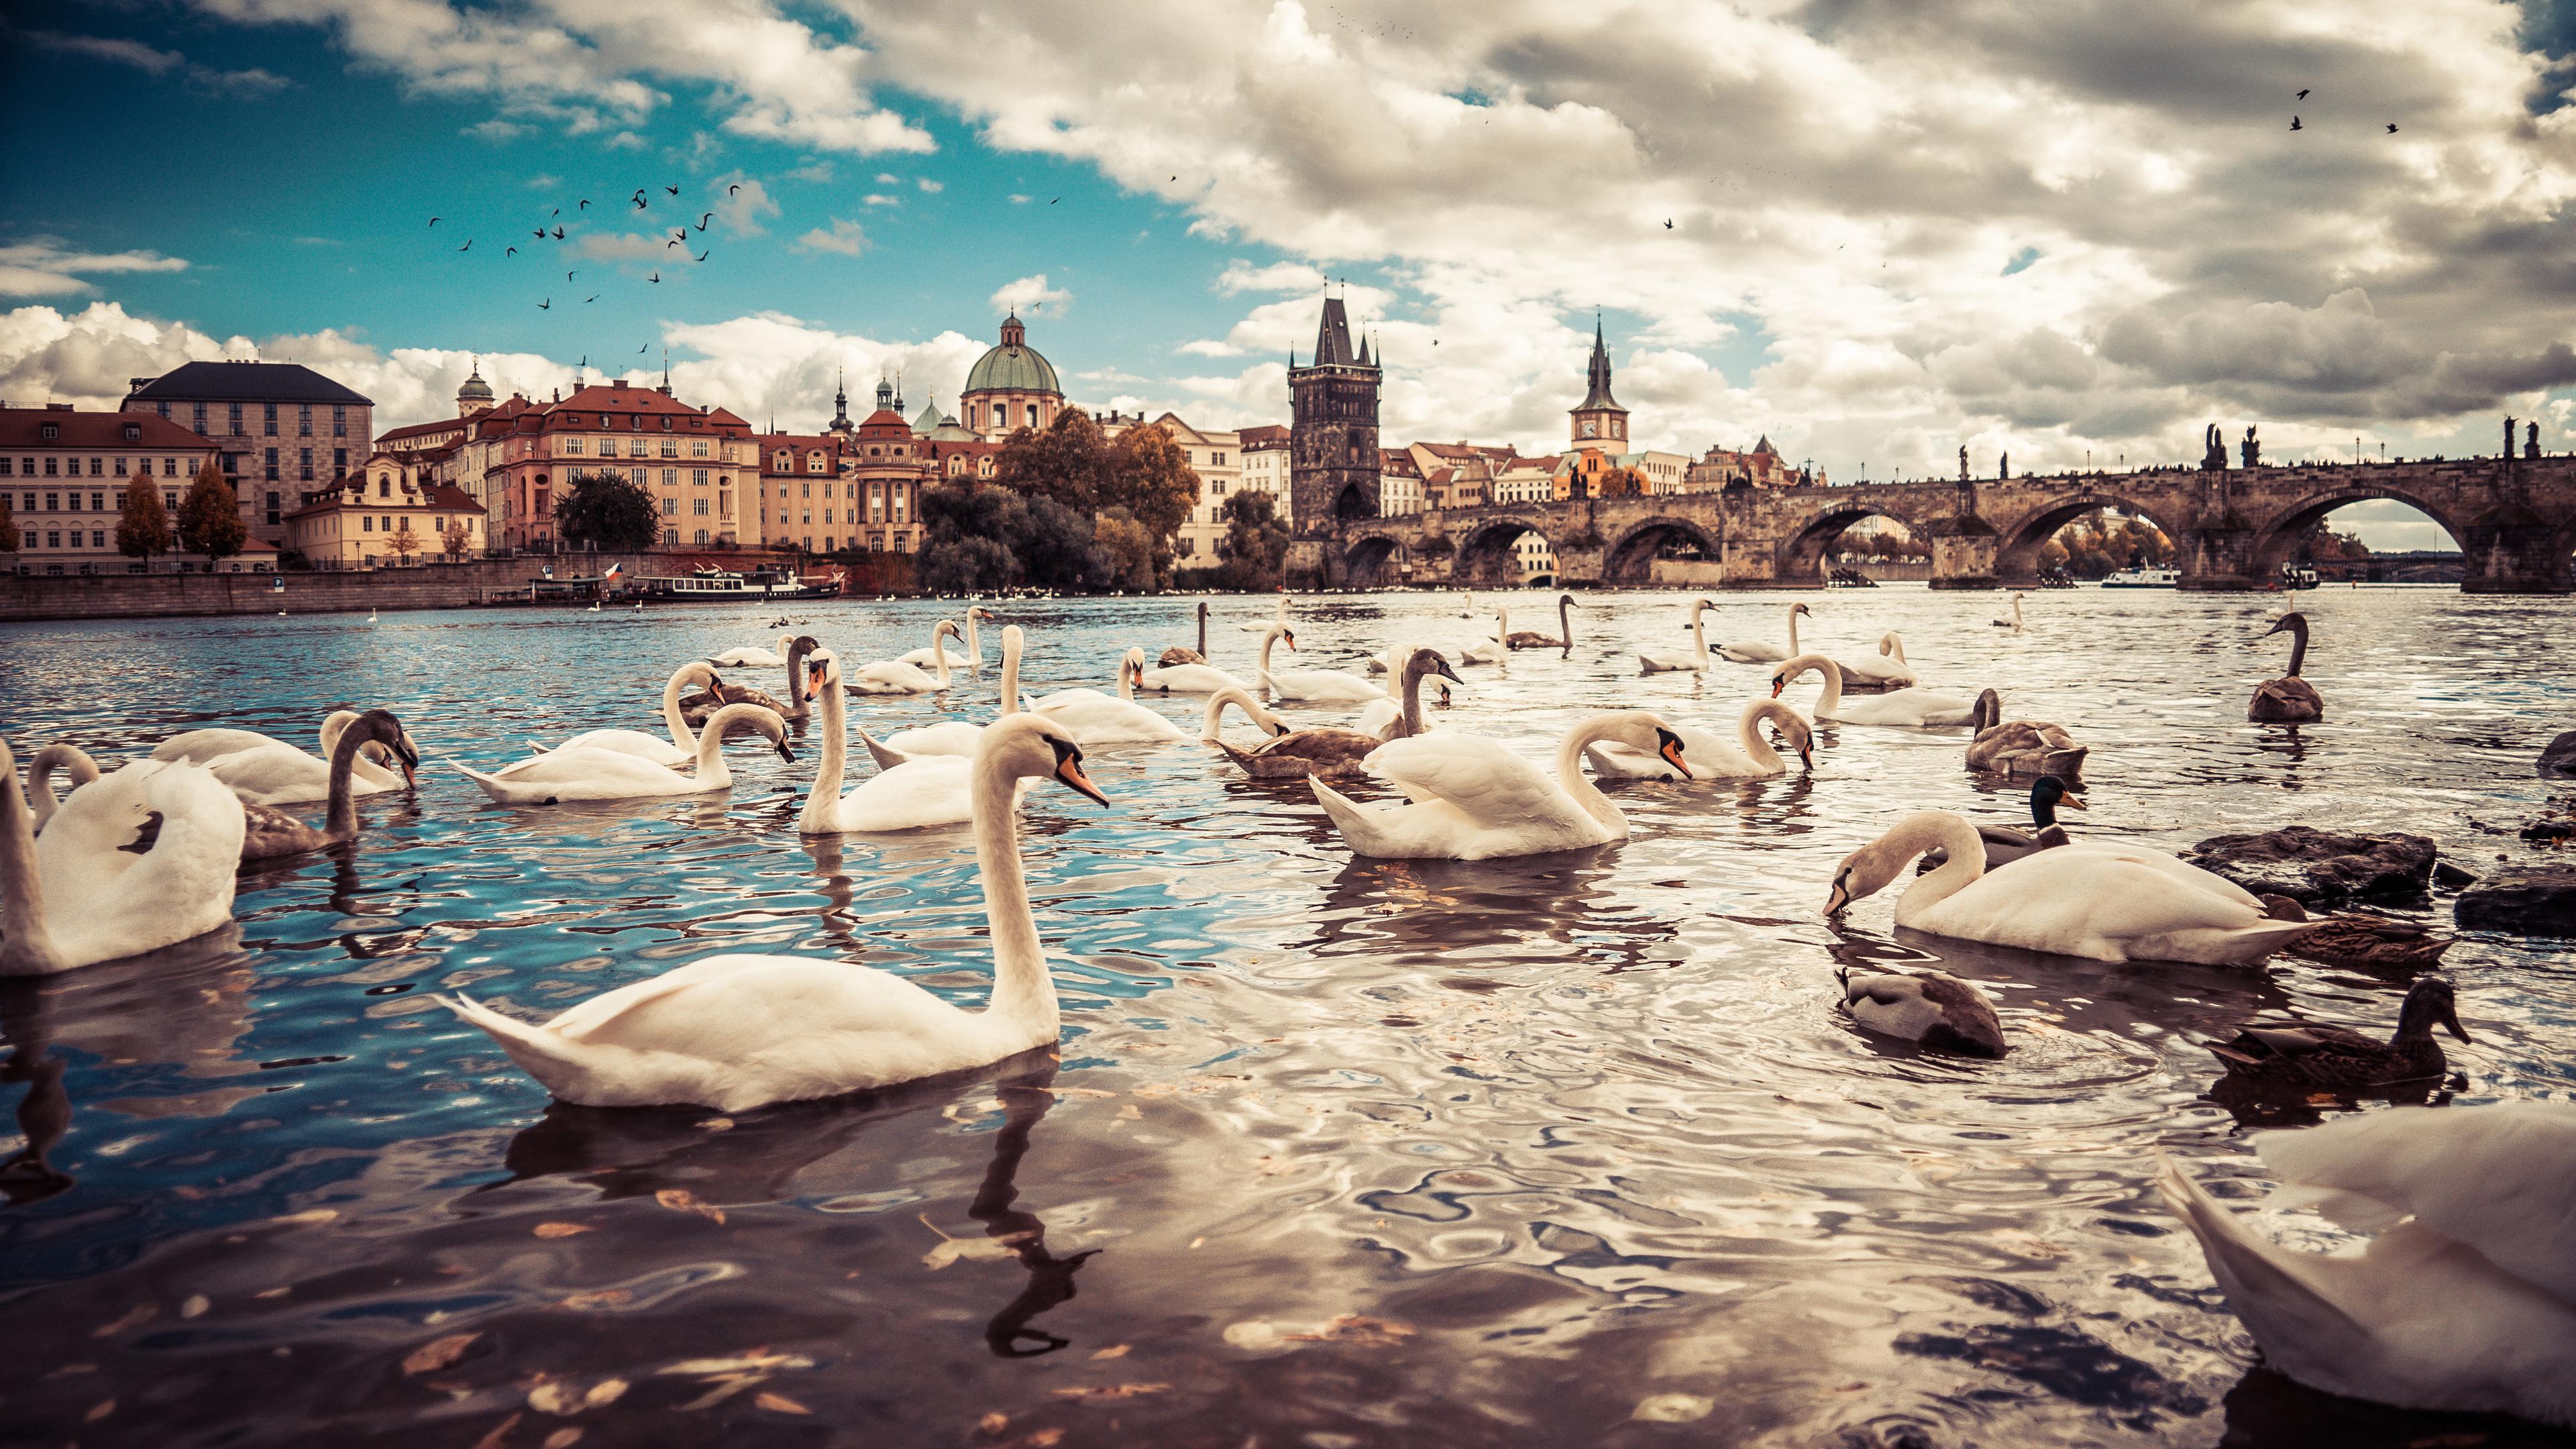 swans-moldau-river-czech-republic-5k-u6.jpg